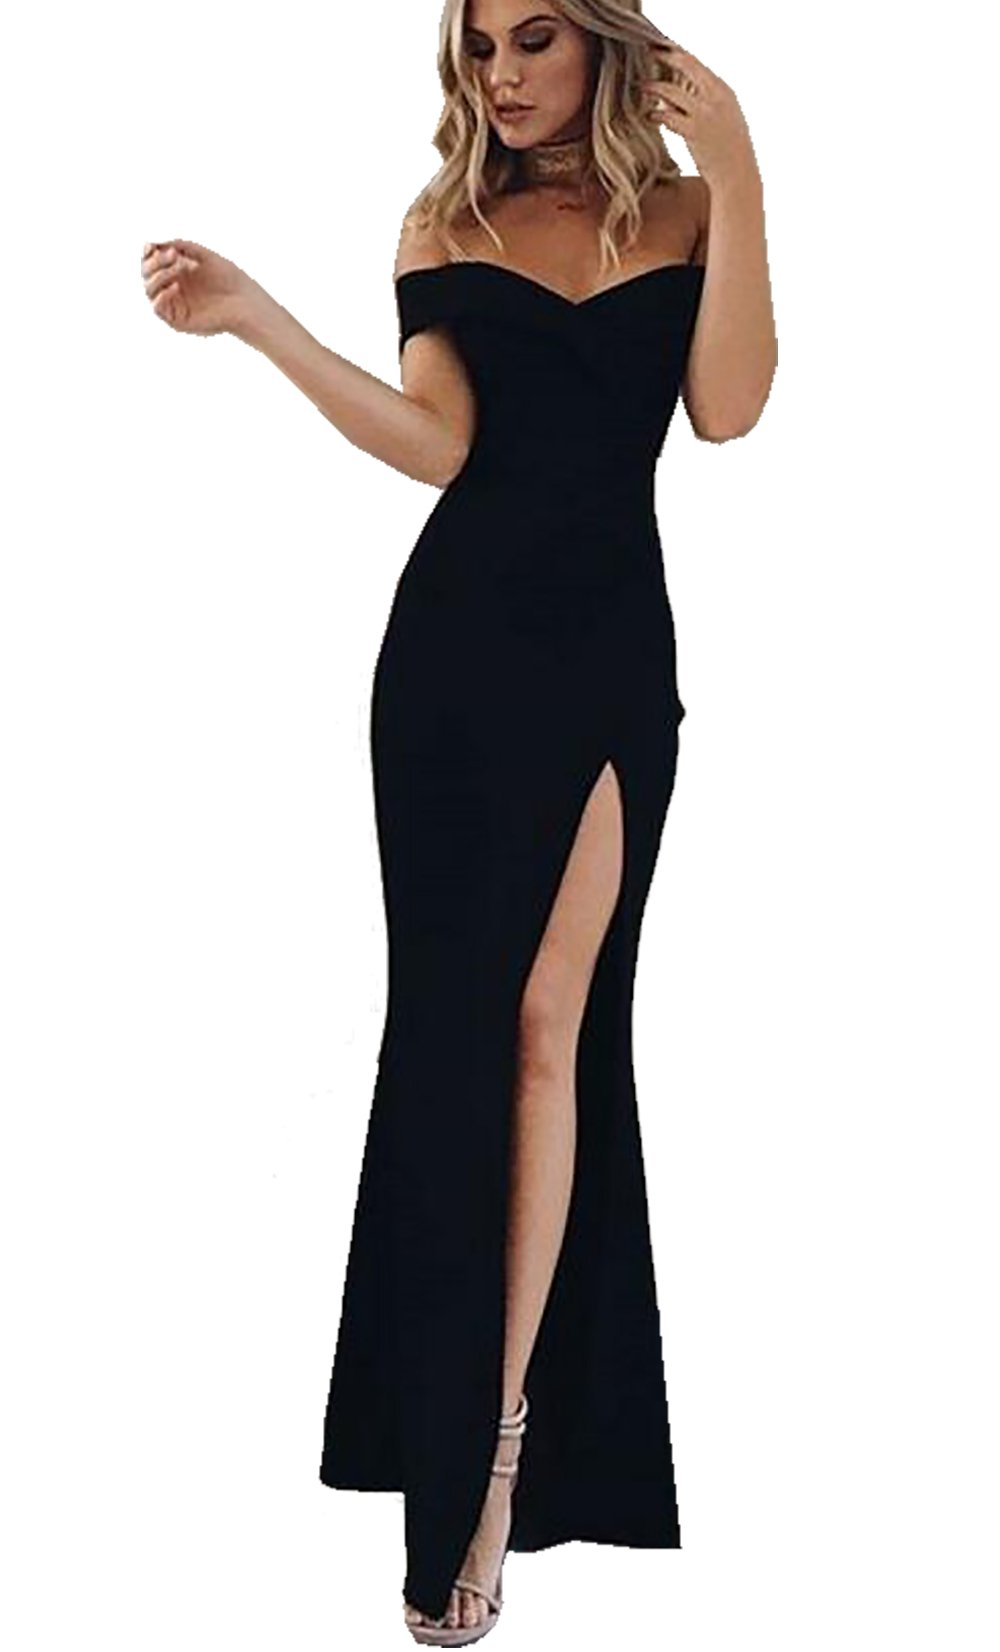 Amazon.com : Leshery New Sexy Women Long Sleeve Prom Ball